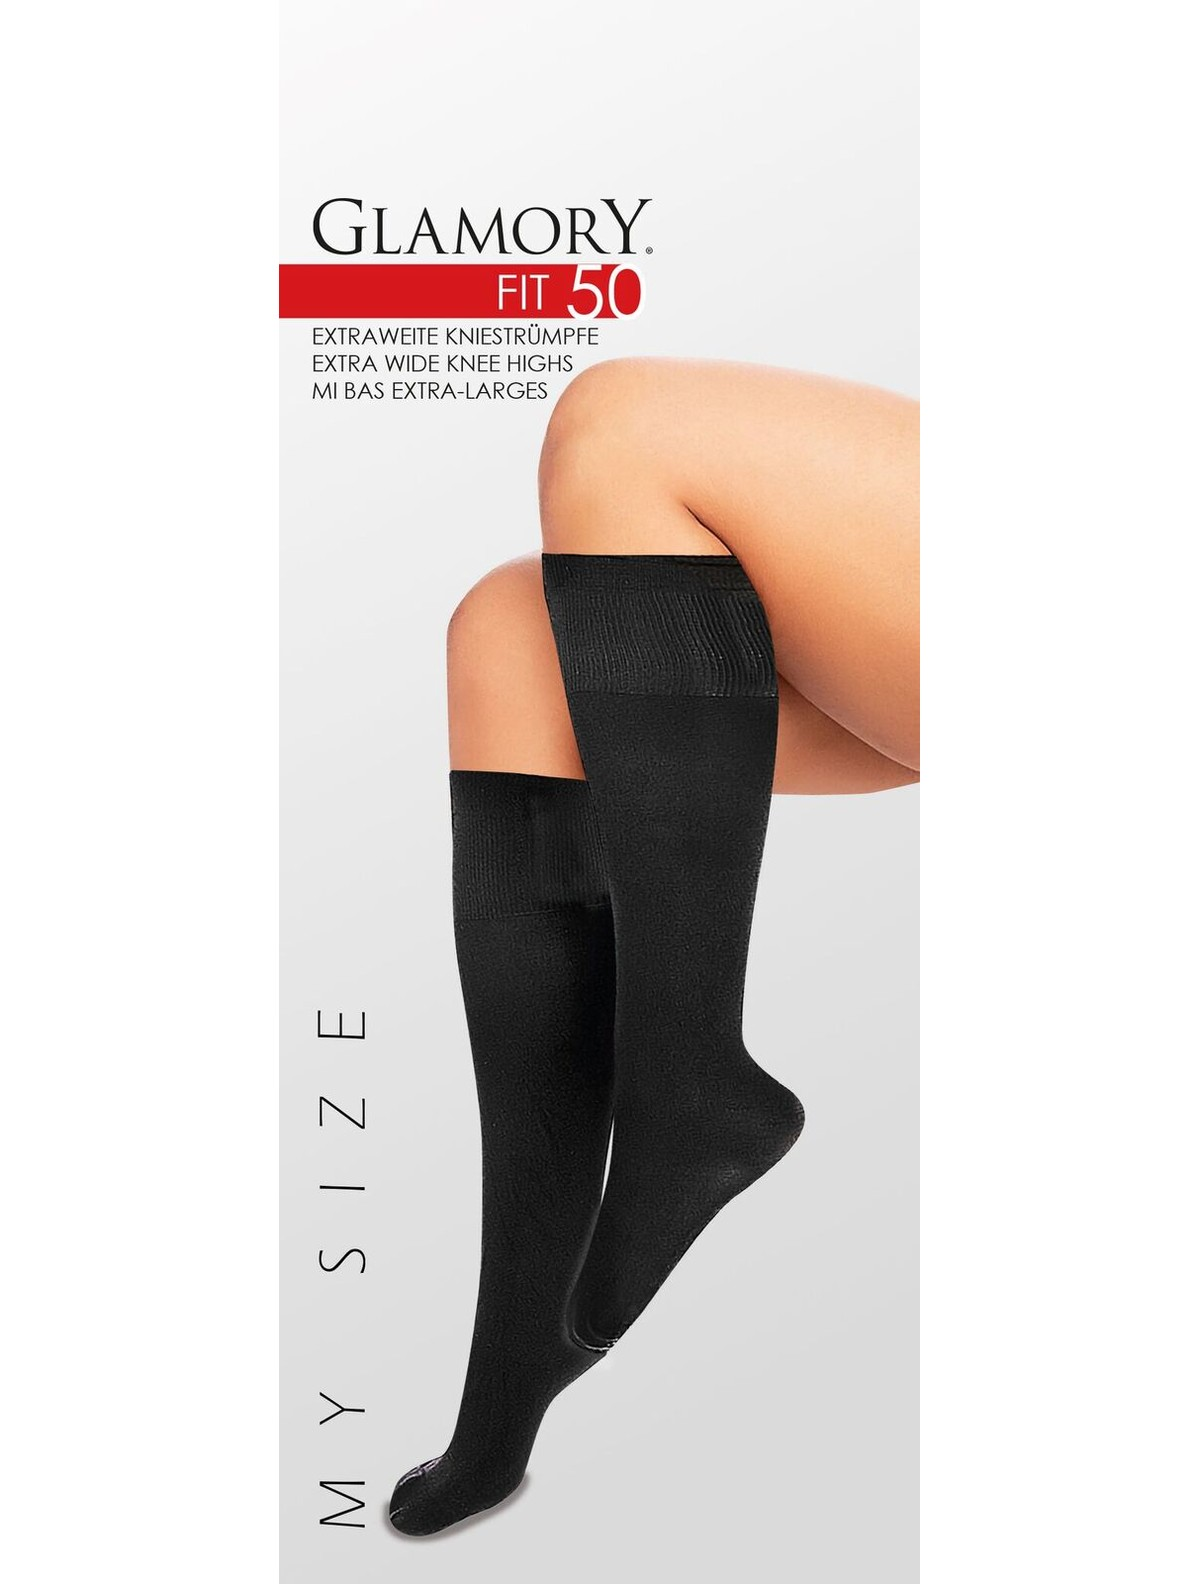 61dce28cf7b Glamory Fit 50 Microfiber Knee High Socks